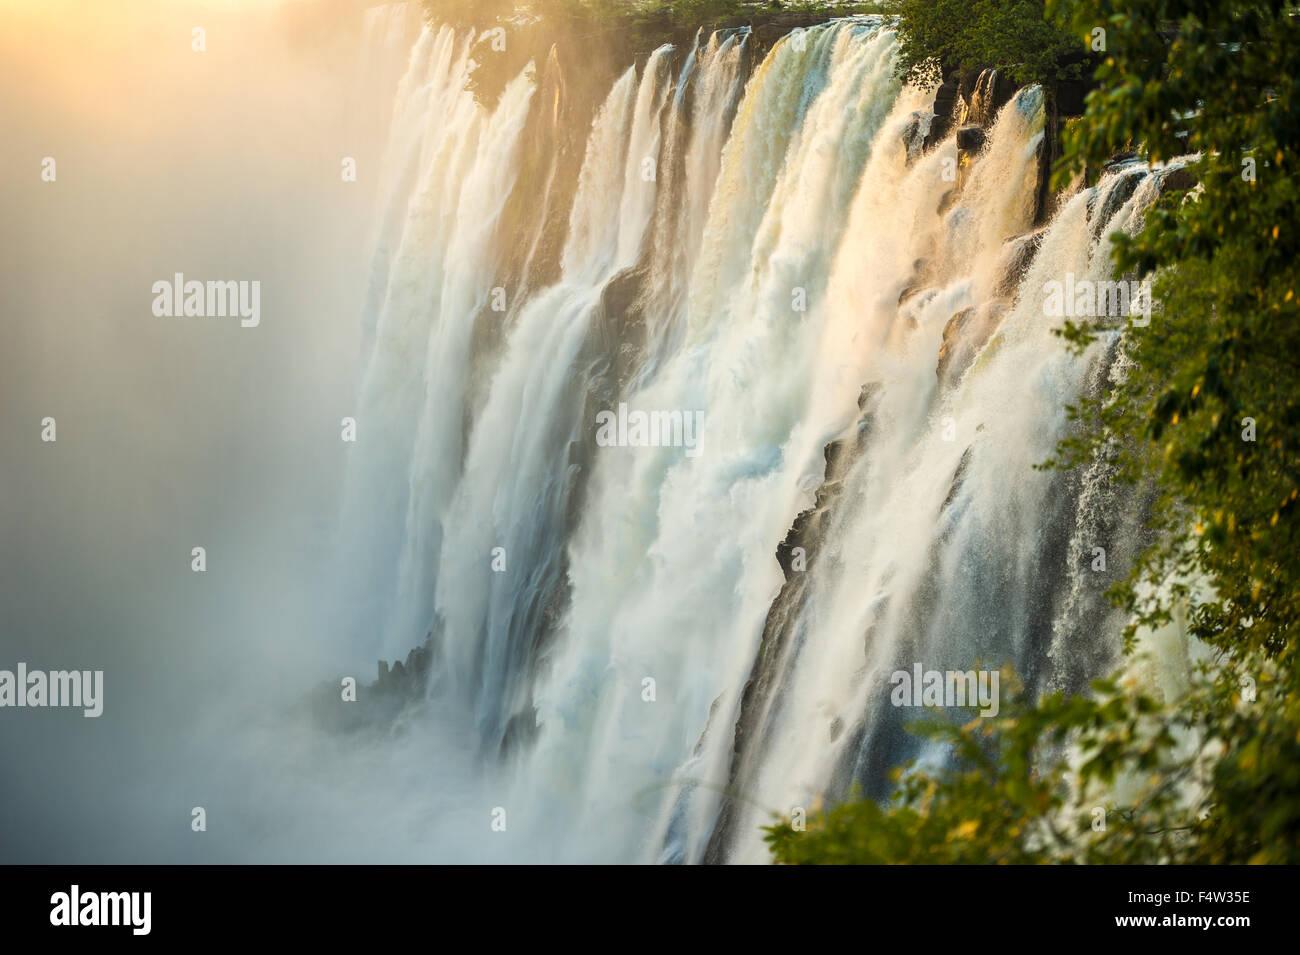 LIVINGSTONE, Sambia, Afrika - Victoria Falls (Mosi-Oa-Tunya) Welten größte Wasserfall, auf dem Zambezi Stockbild